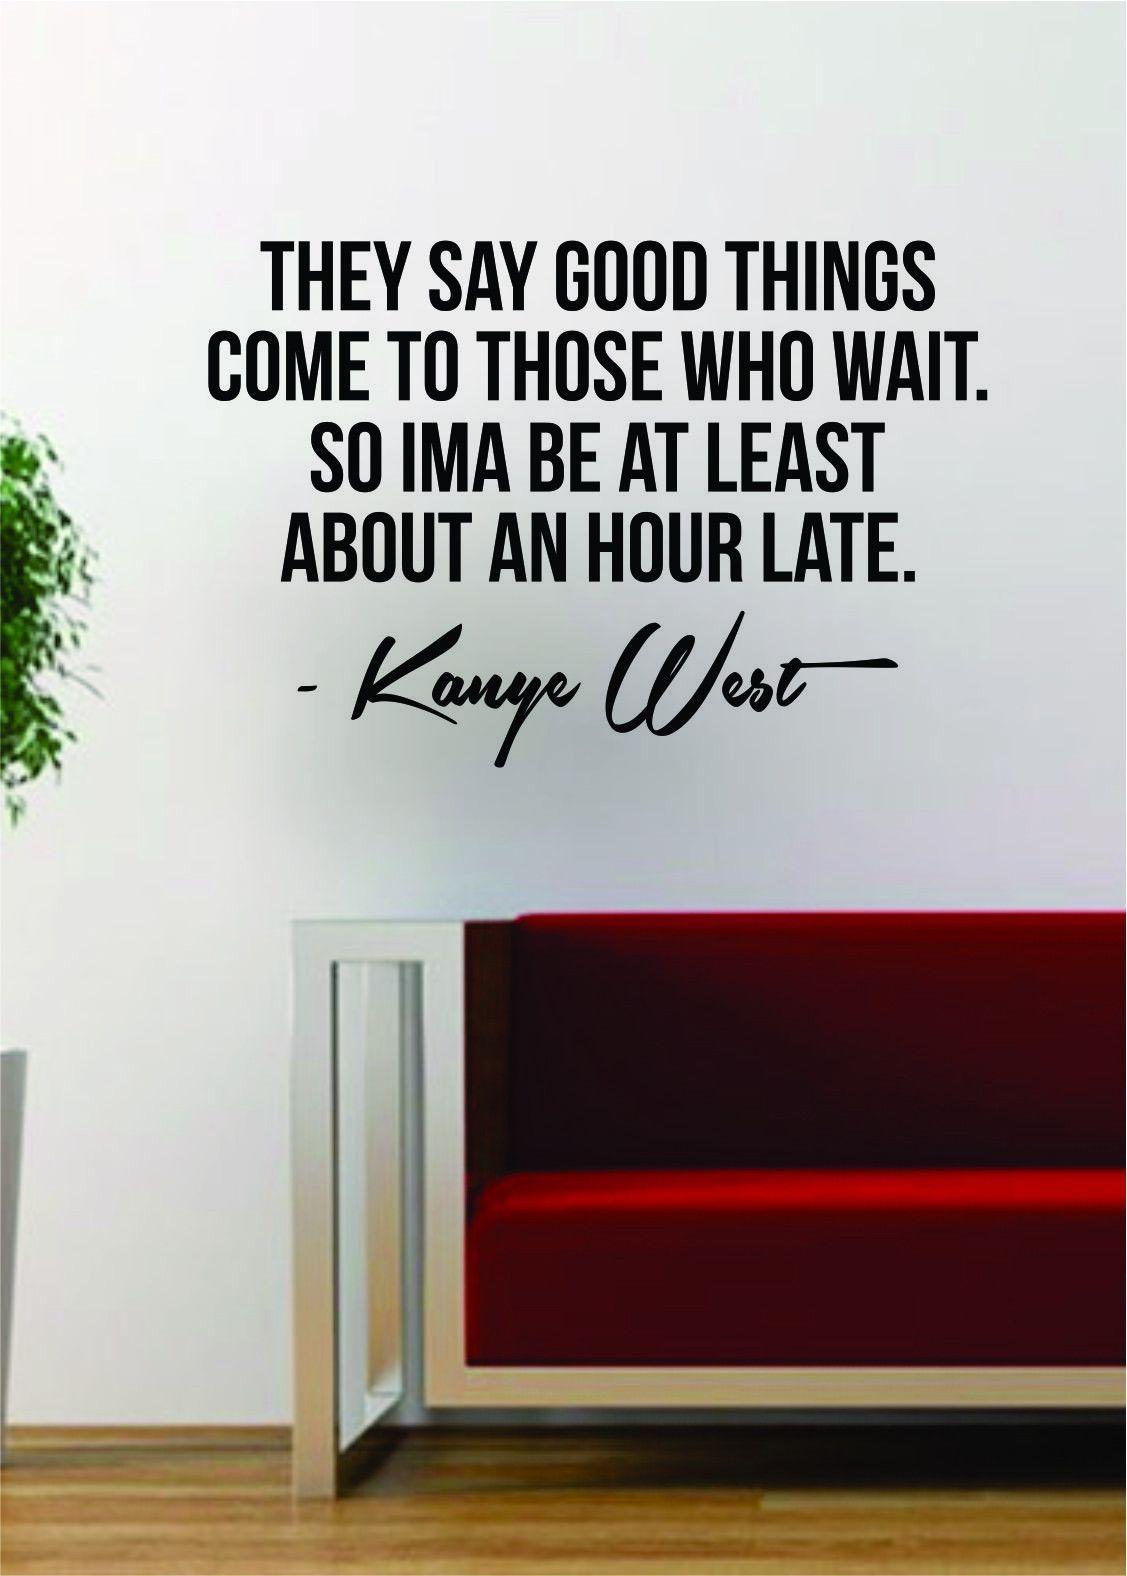 State Kanye West Good Things Quote Decal Sticker Wall Vinyl Art Music Lyrics Homedecor Yeezy Yeezus Kanye West Good Things Quote Decal Sticker Wall Vinyl Art Music